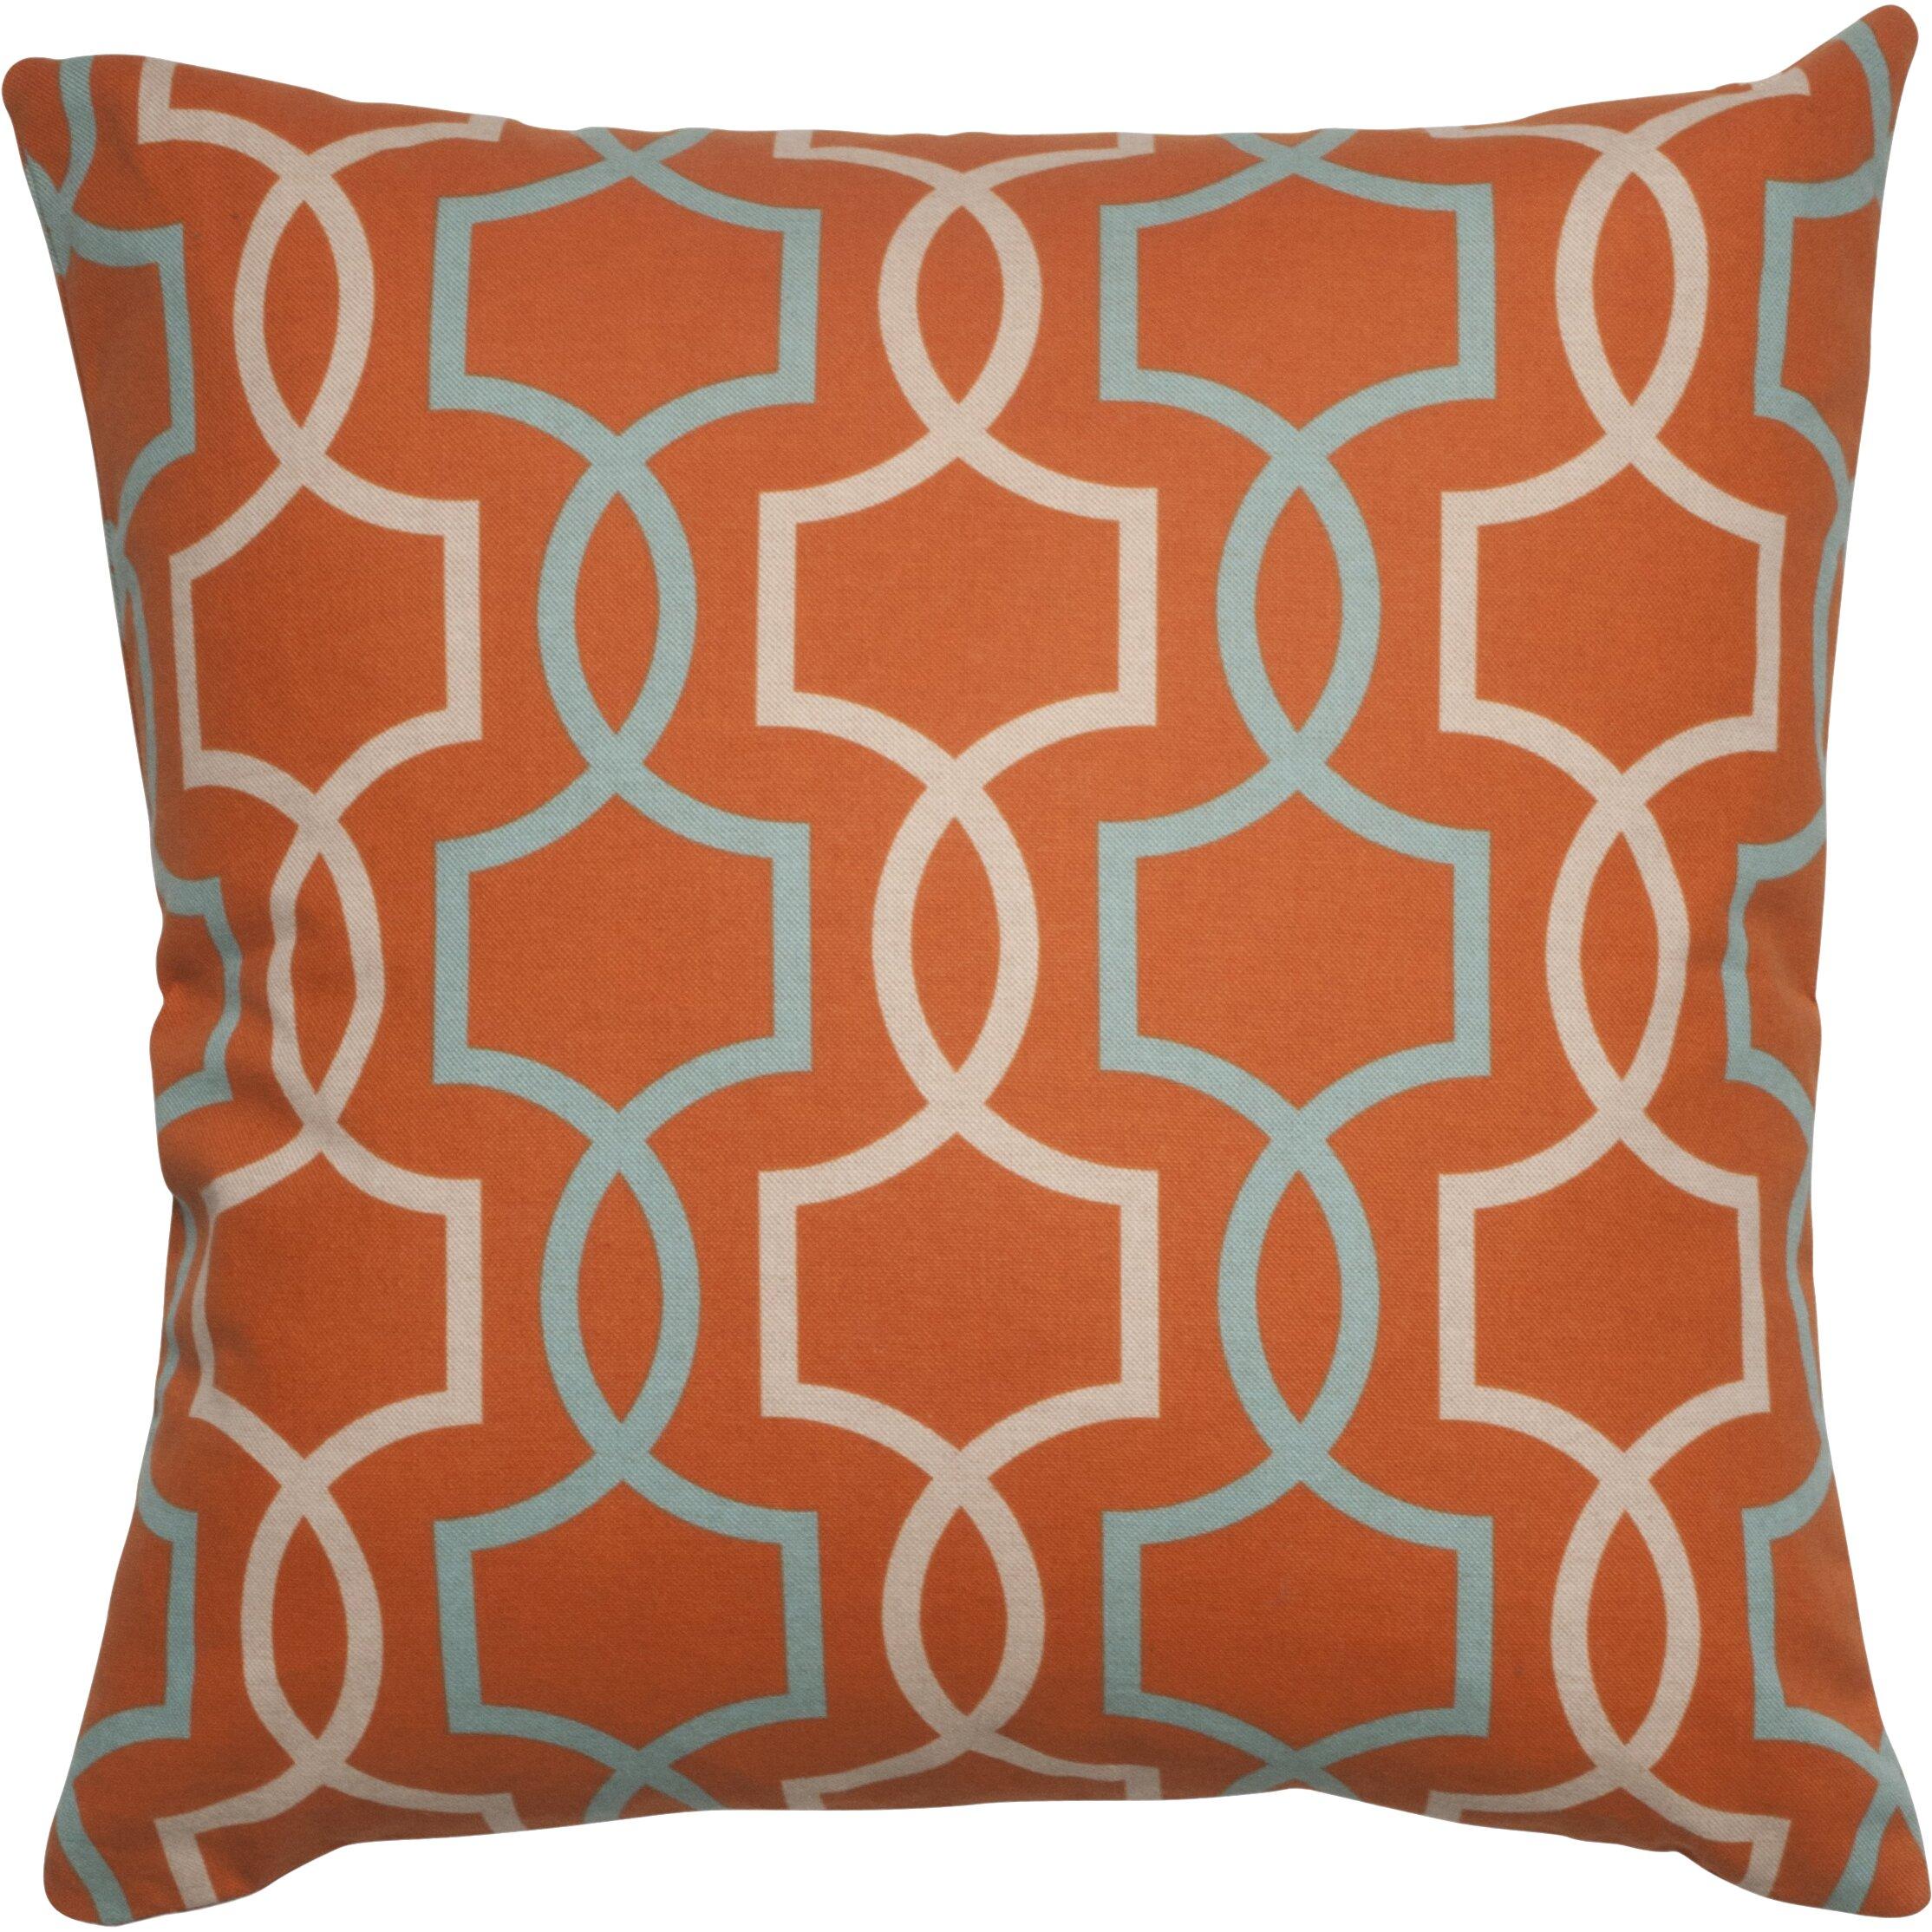 Throw Pillow Fillers : Vesper Lane Angola Designer Filled Throw Pillow & Reviews Wayfair